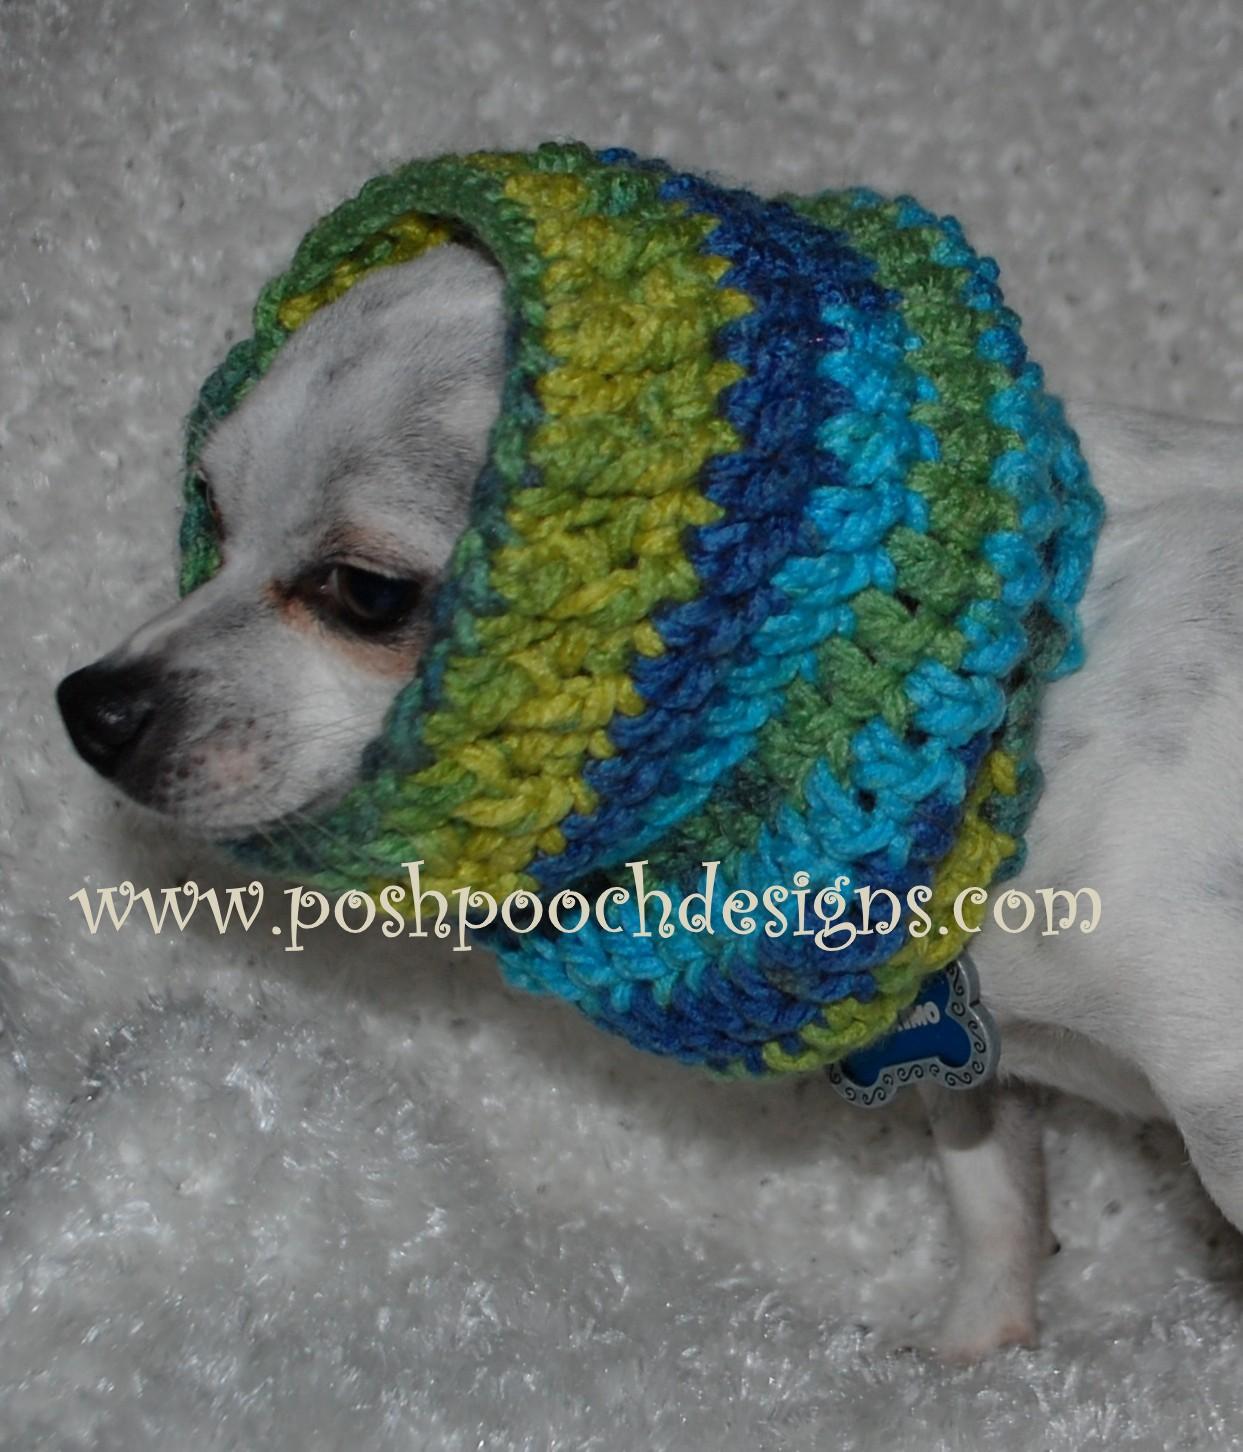 Free Crochet Pattern Dog Snood : Posh Pooch Designs Dog Clothes: Dog Snood Crochet Pattern ...